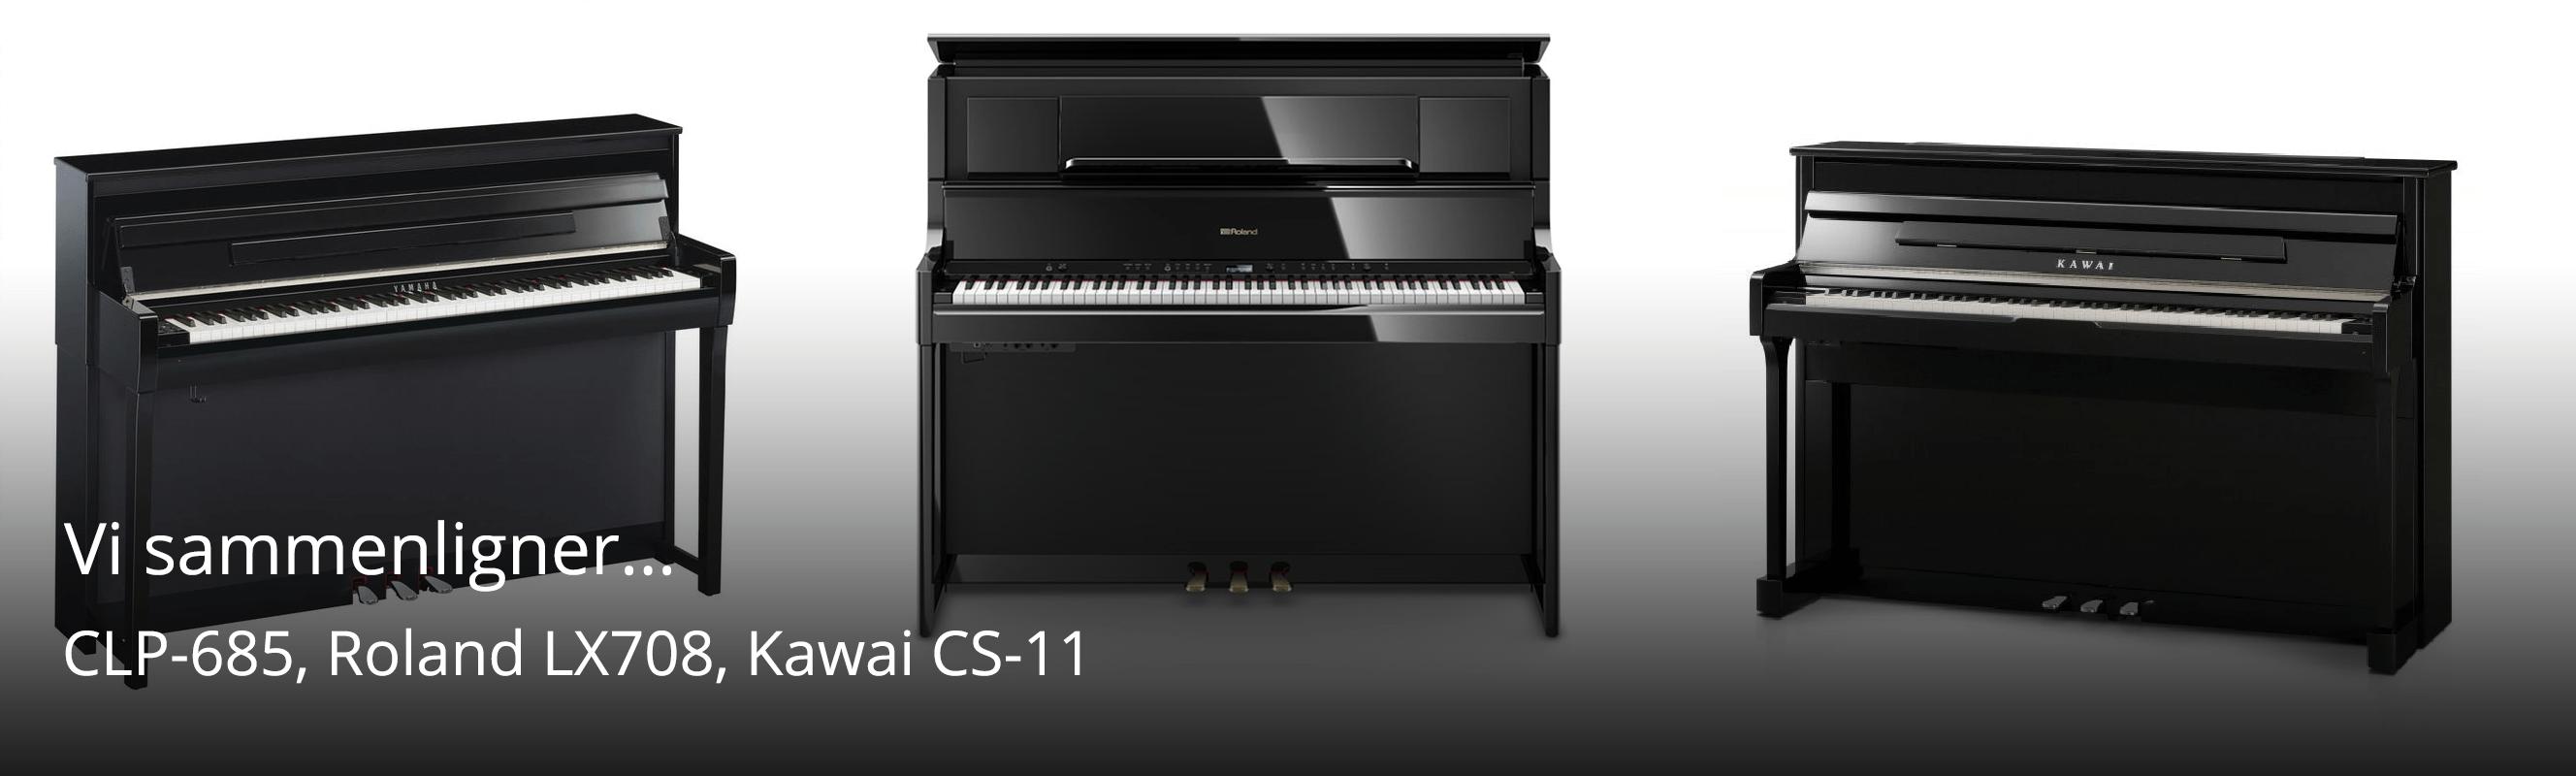 Sammenligning af Kawai CS-11, Yamaha CLP-685 og Roland LX-708